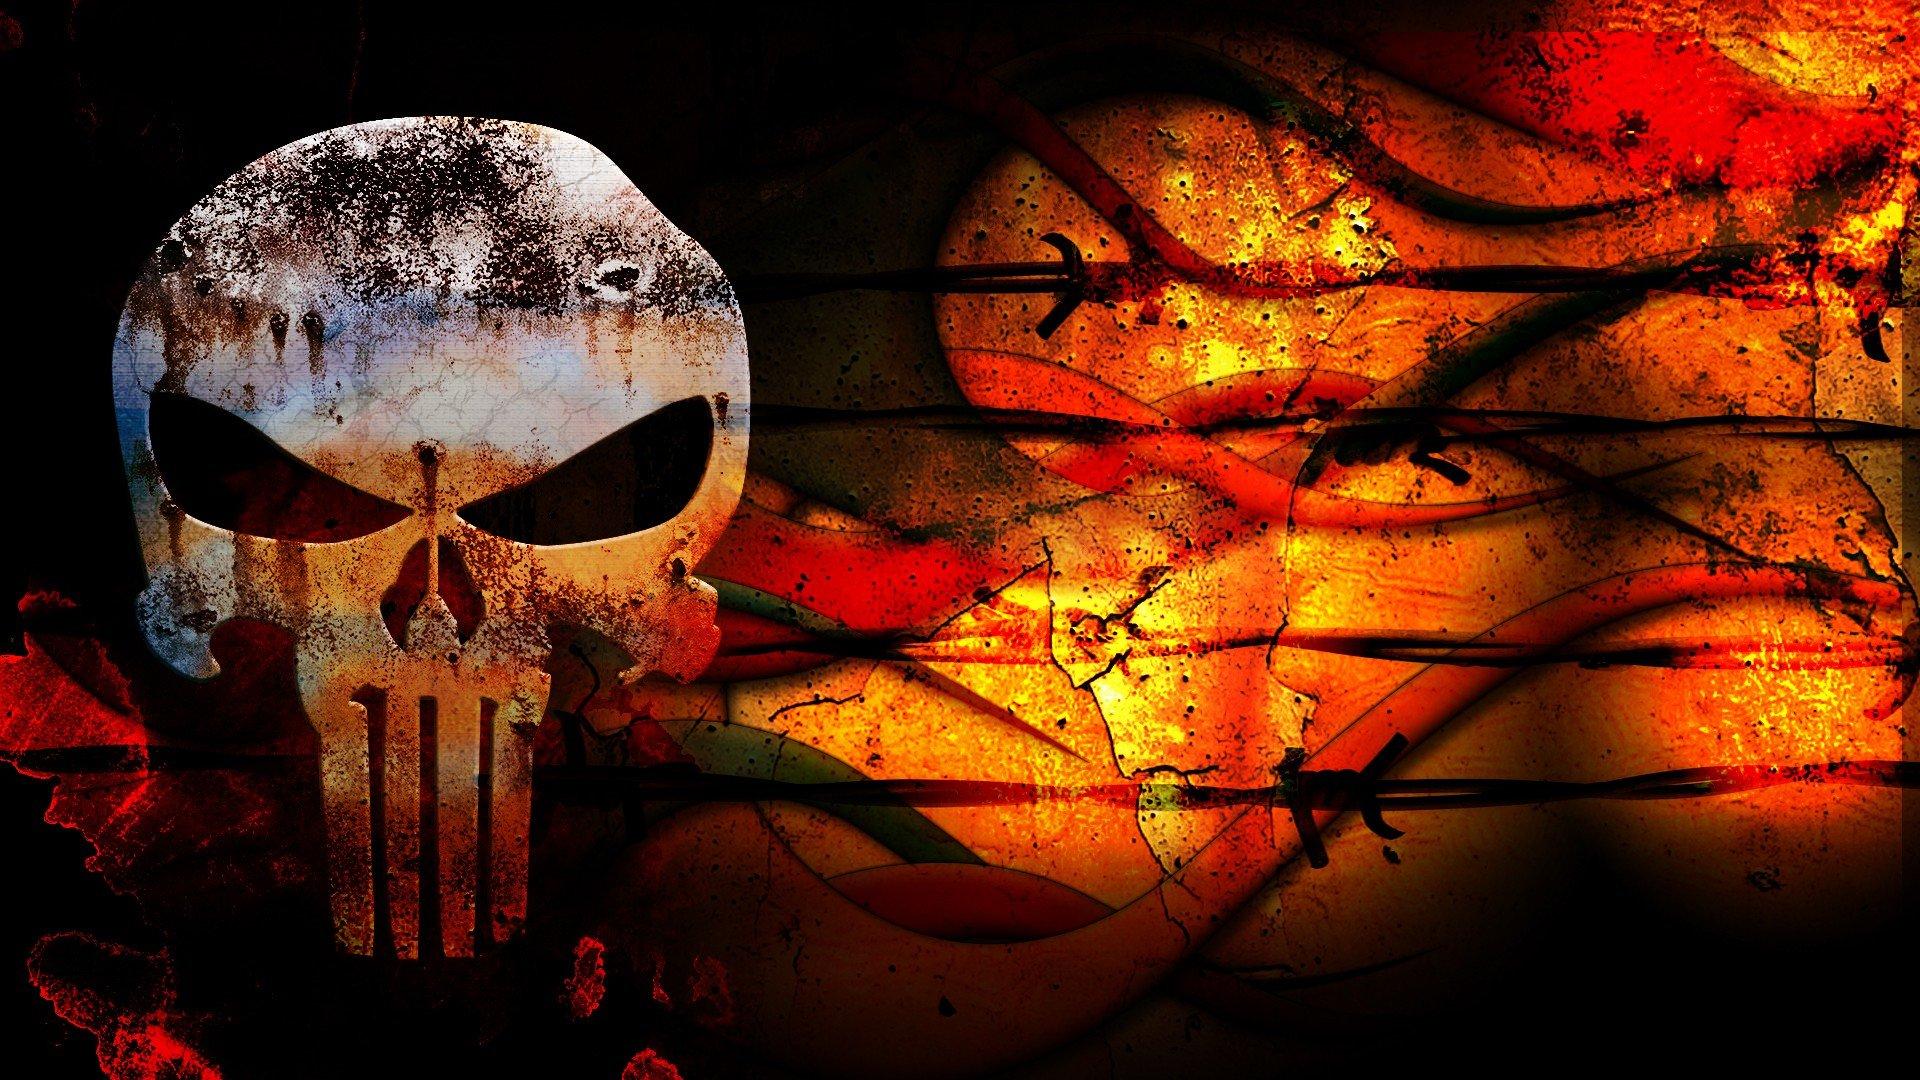 Grunge The Punisher blank wallpaper | 1920x1080 | 258834 | WallpaperUP